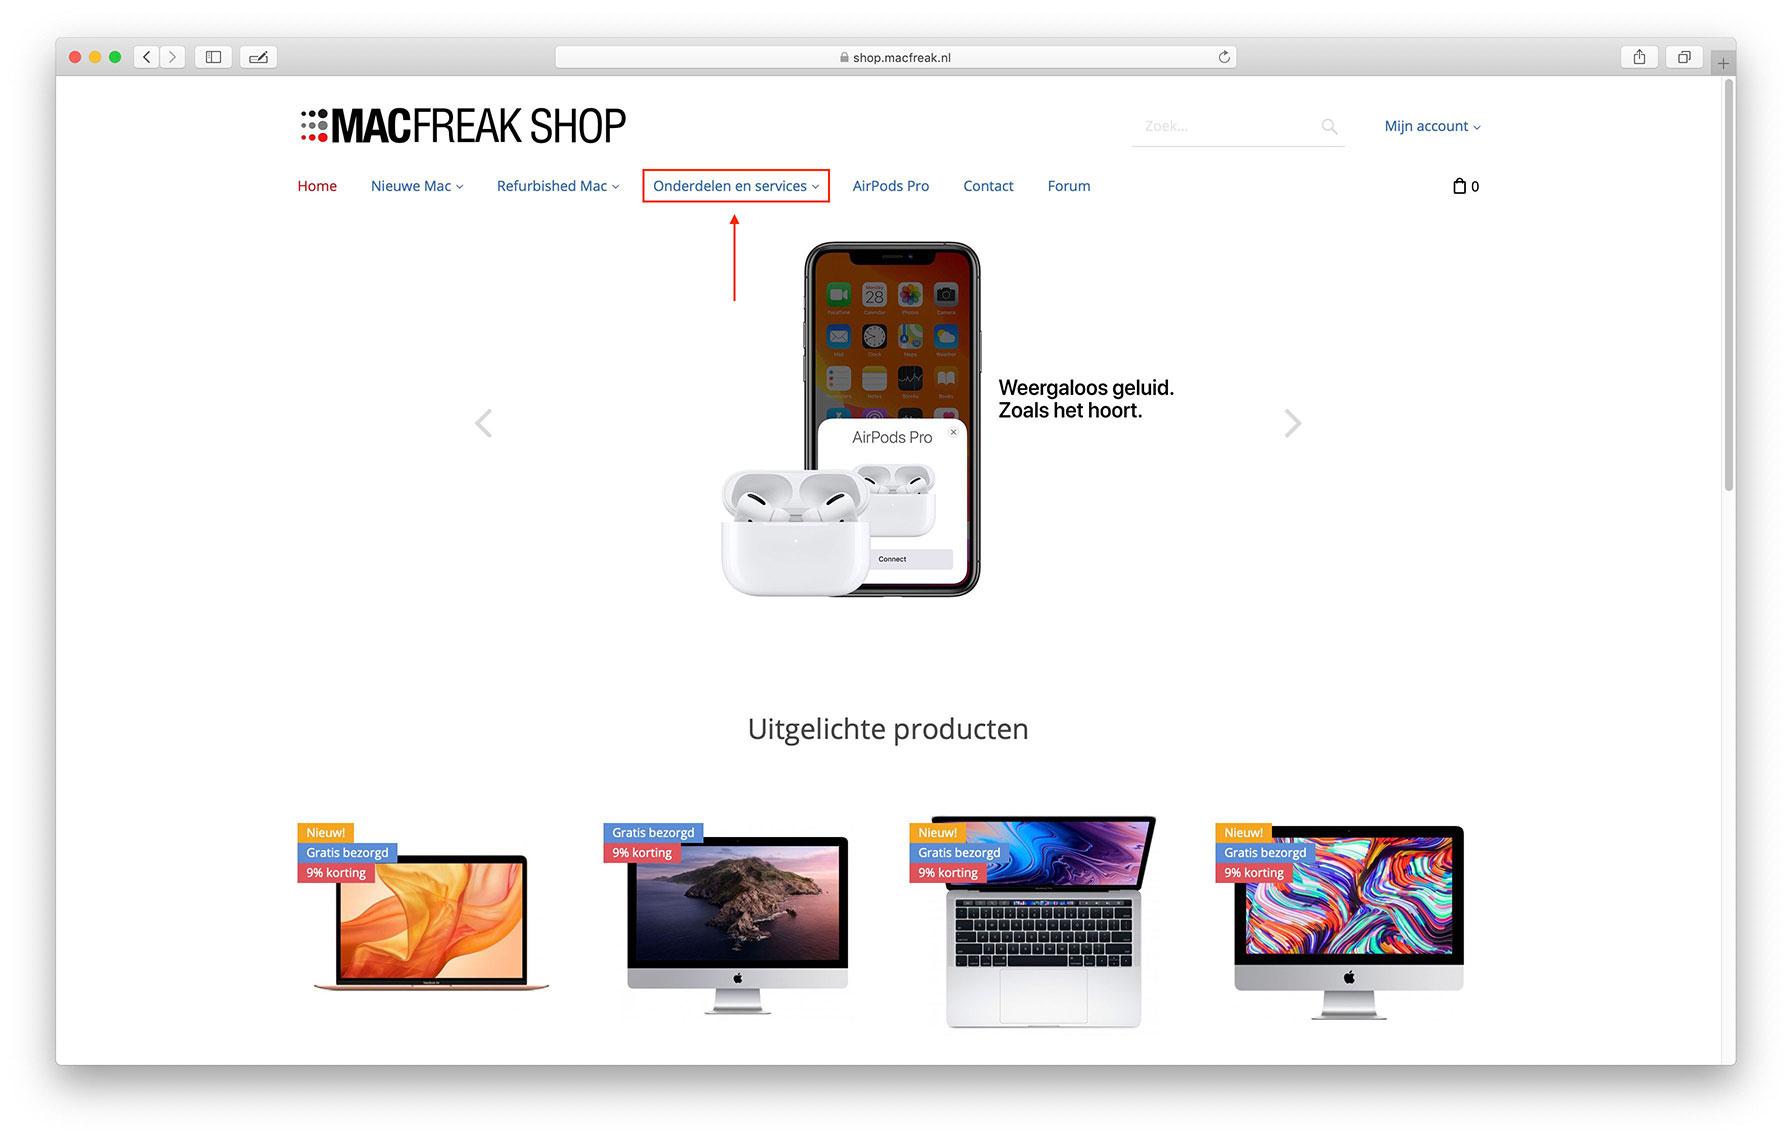 https://www.macfreak.nl/modules/news/images/zArt.MacFreakShopServicesEnOnderdelen.jpg